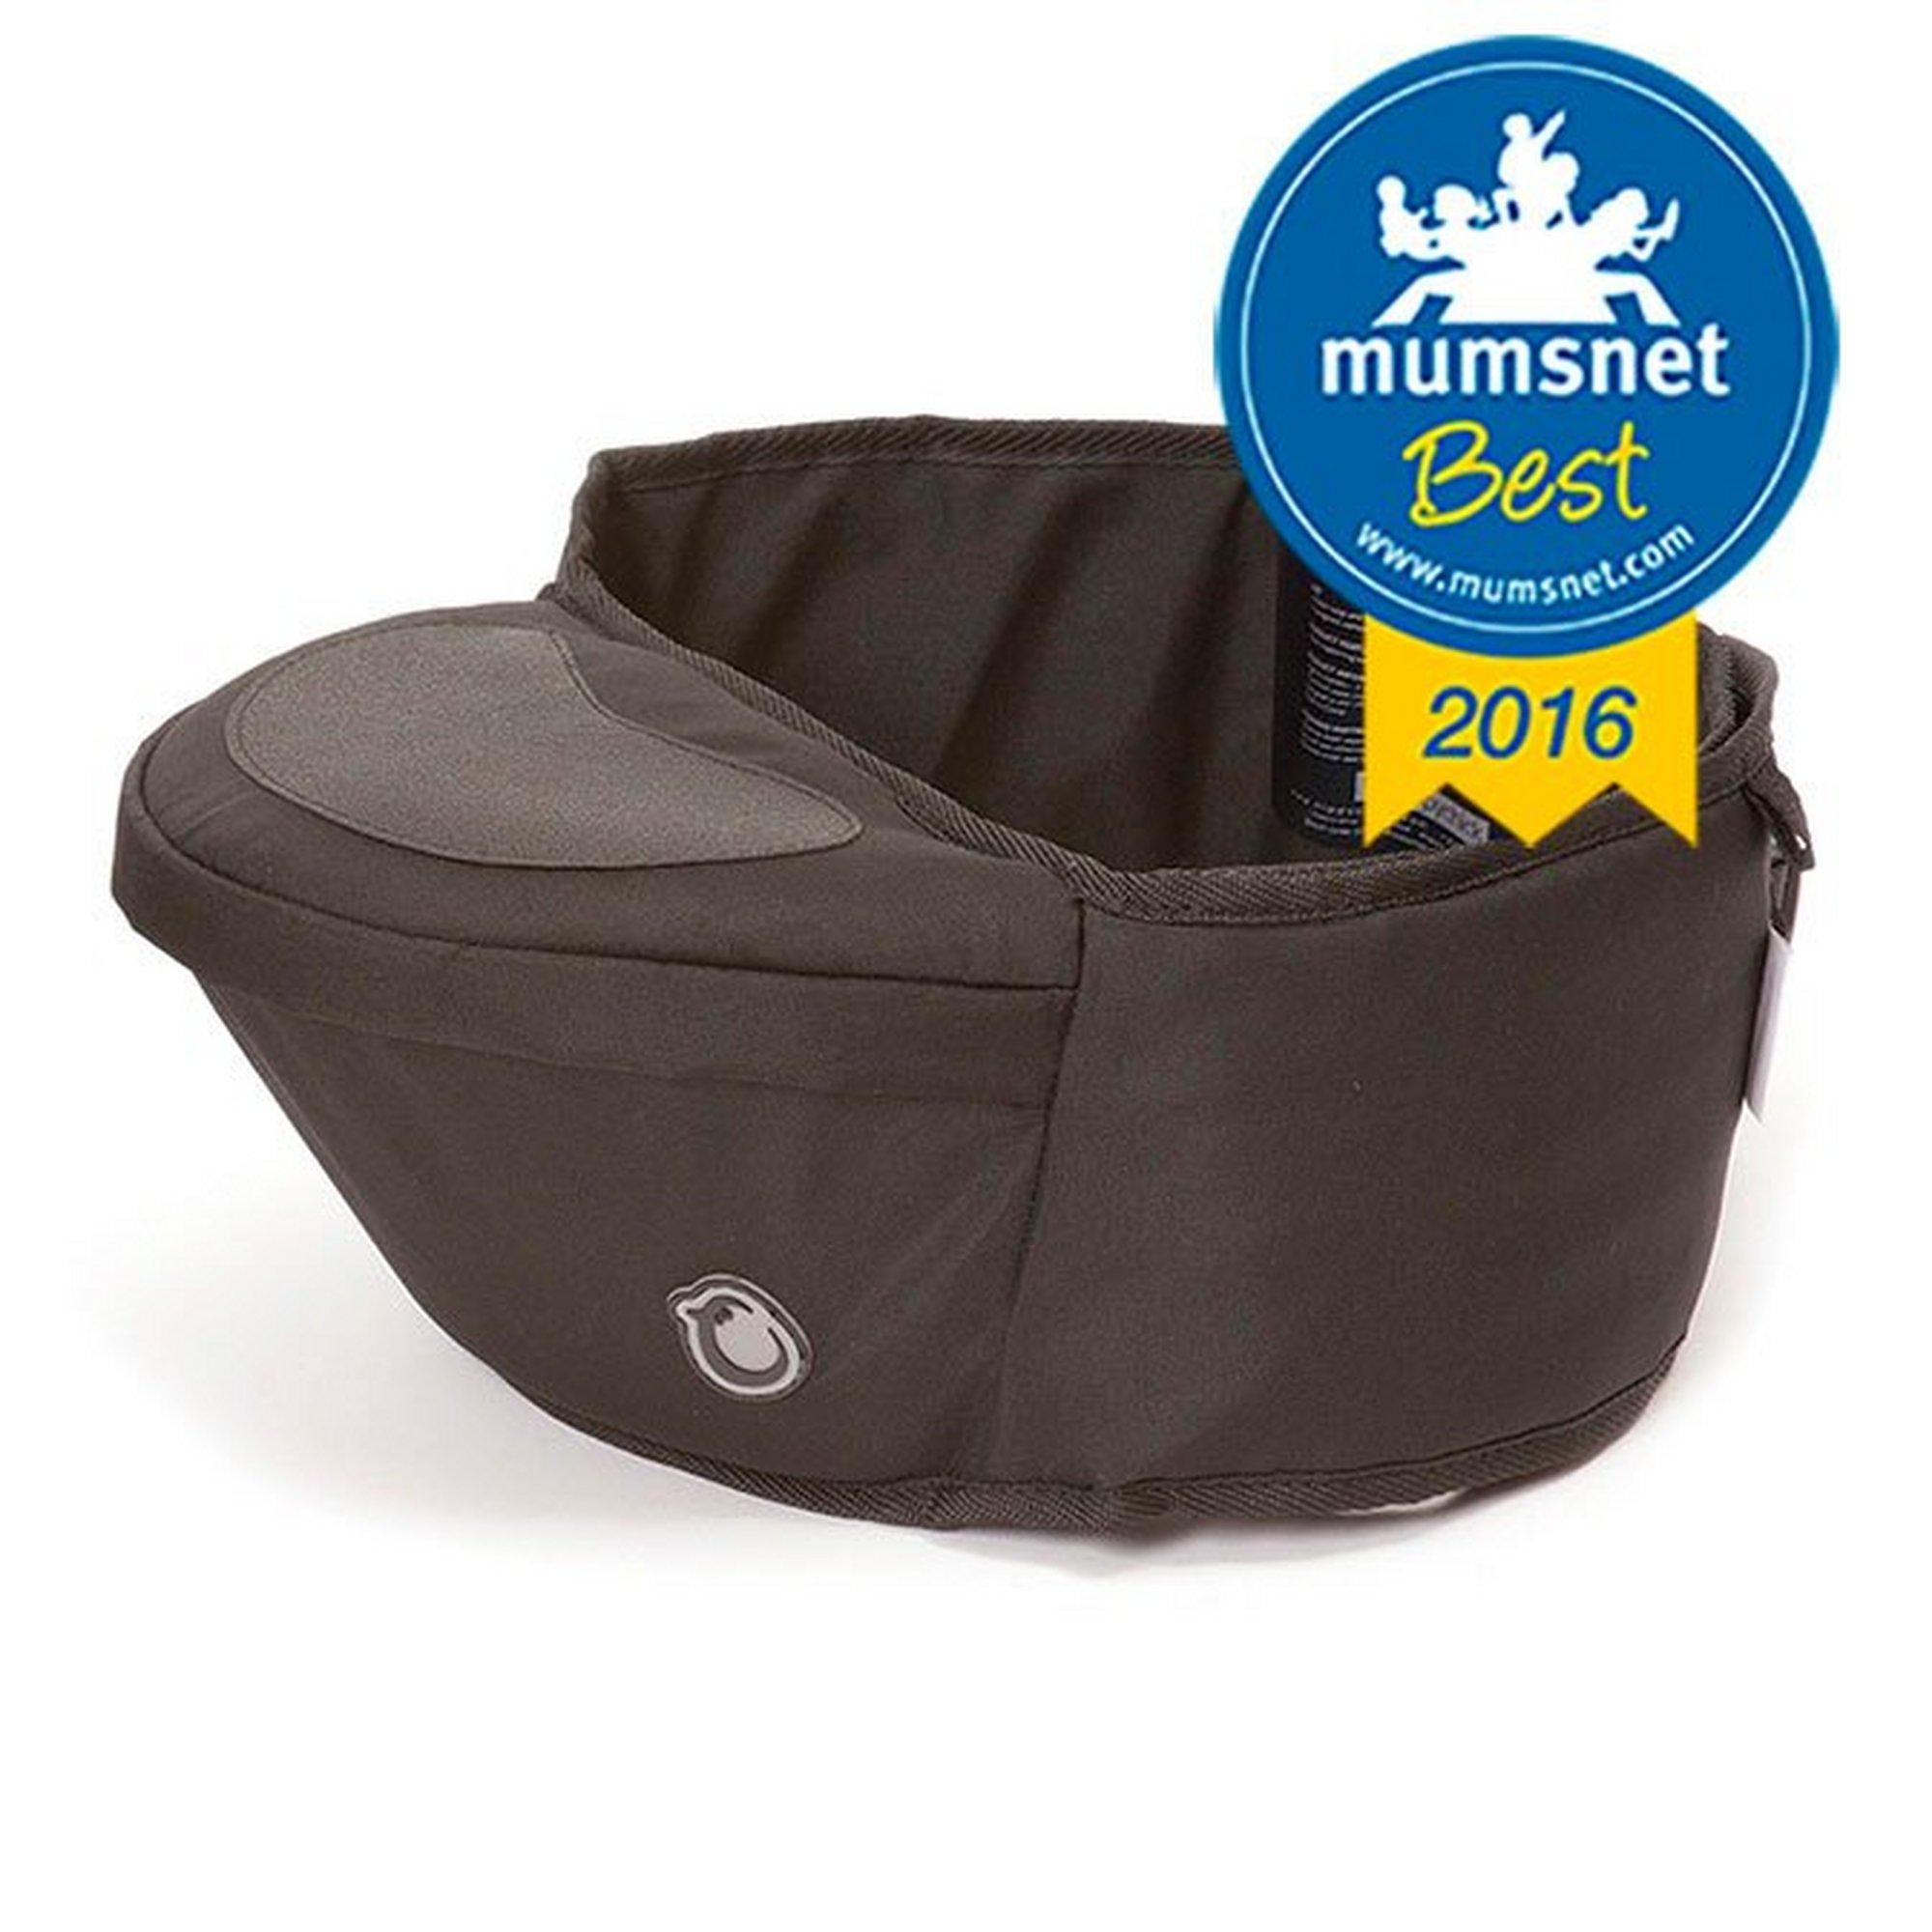 Image of Bagged Hip Seat